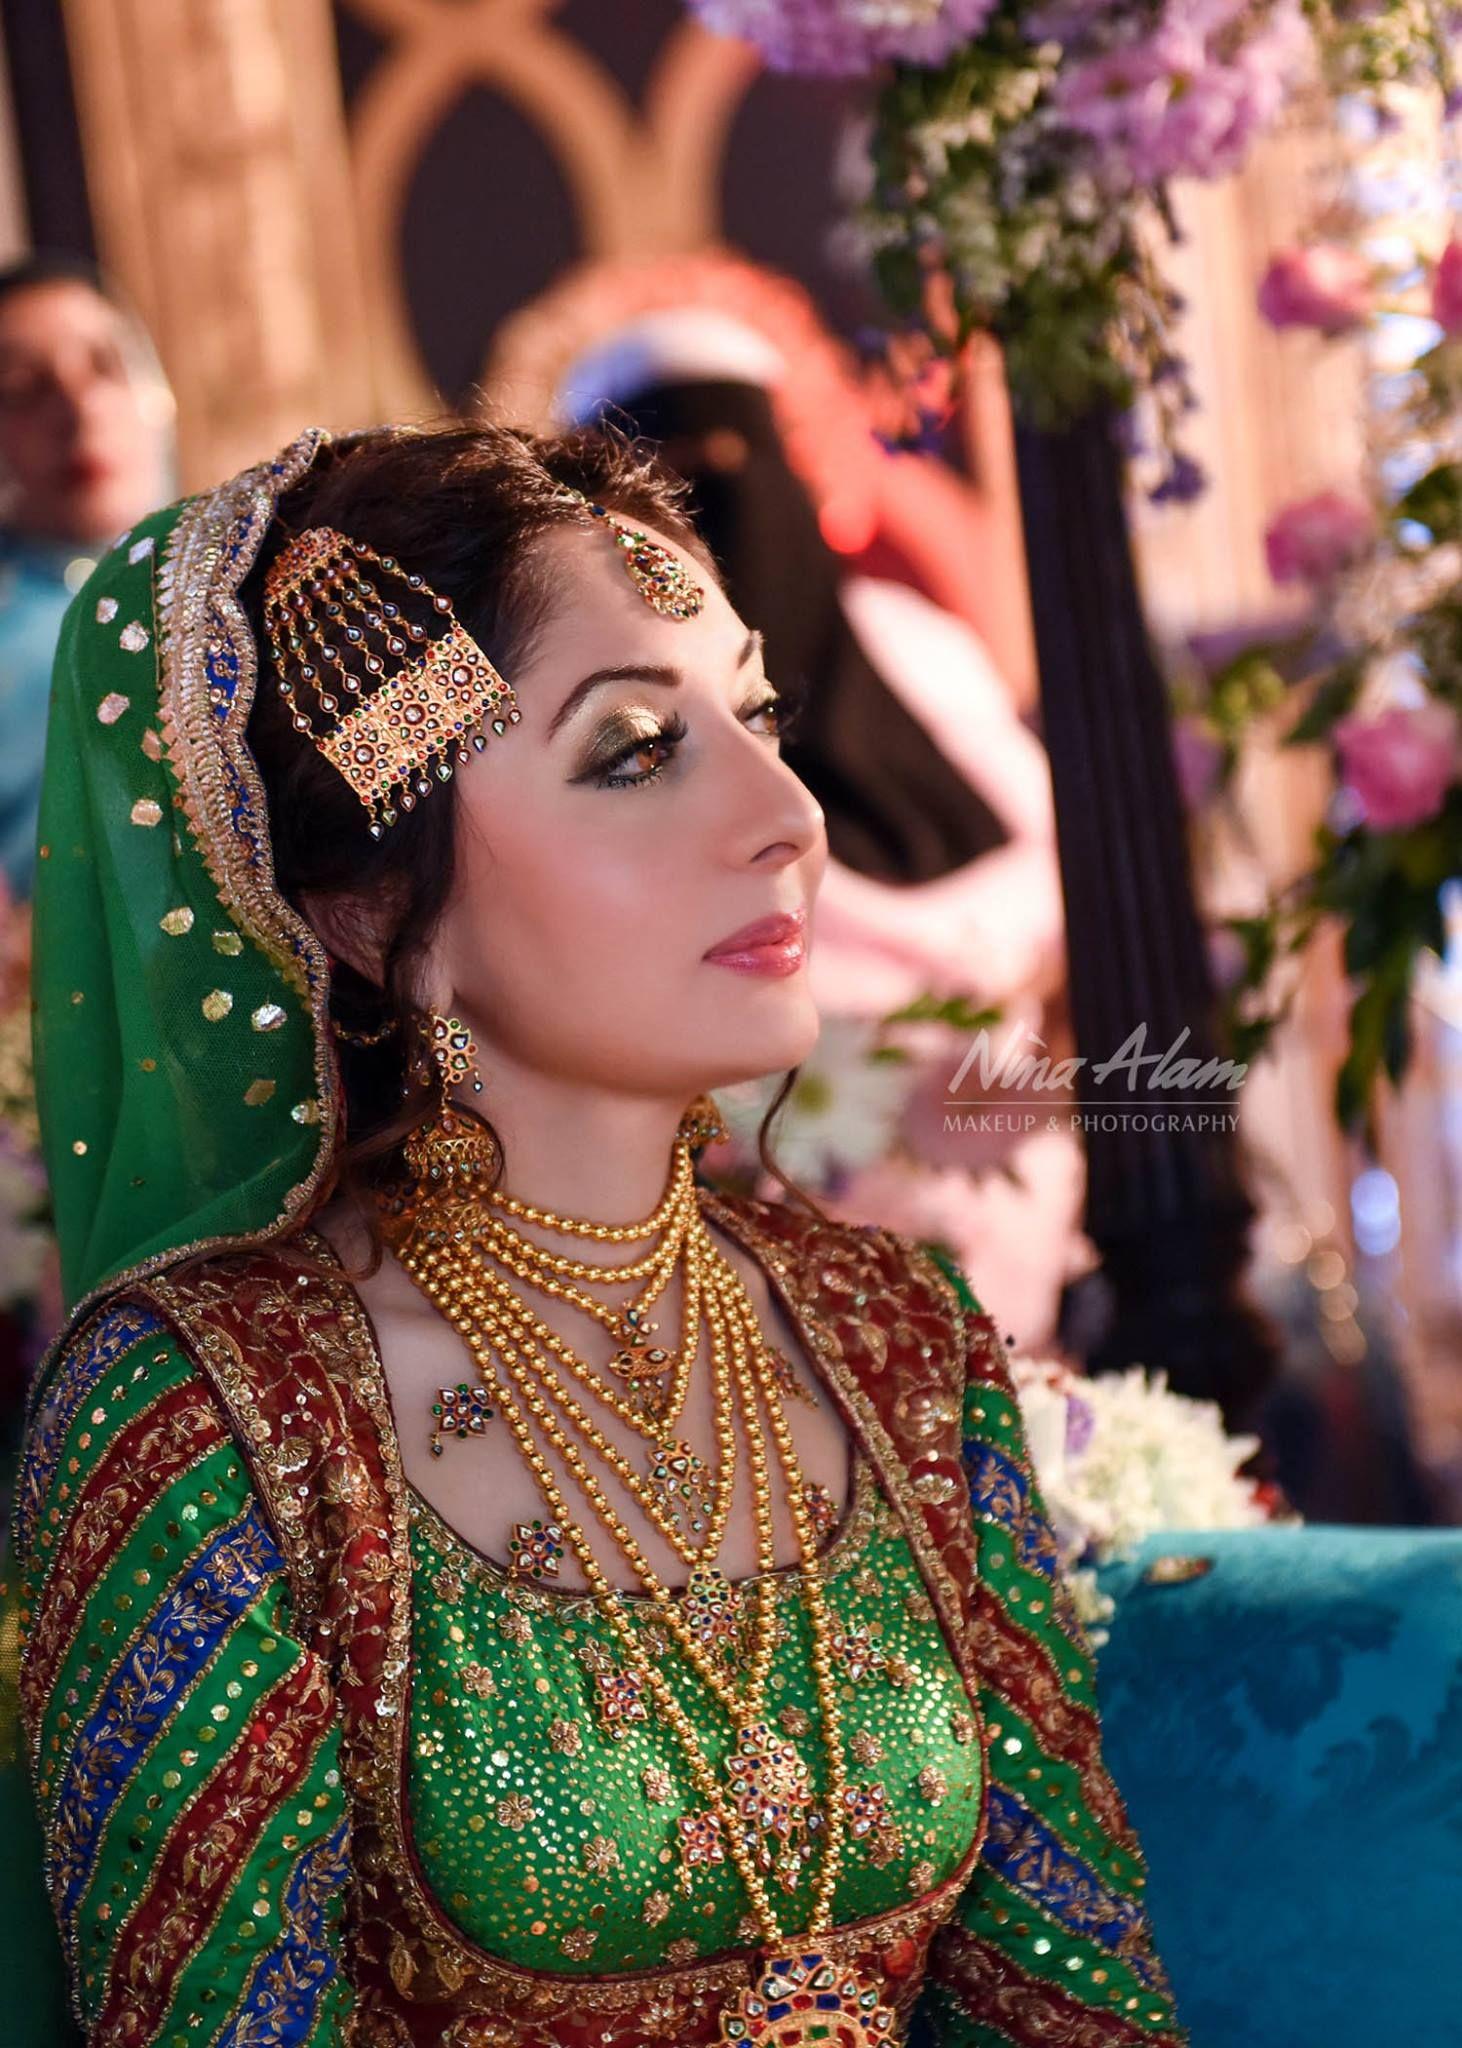 Sindhudesh; G M Syed - Panhwar.Com - MAFIADOC.COM